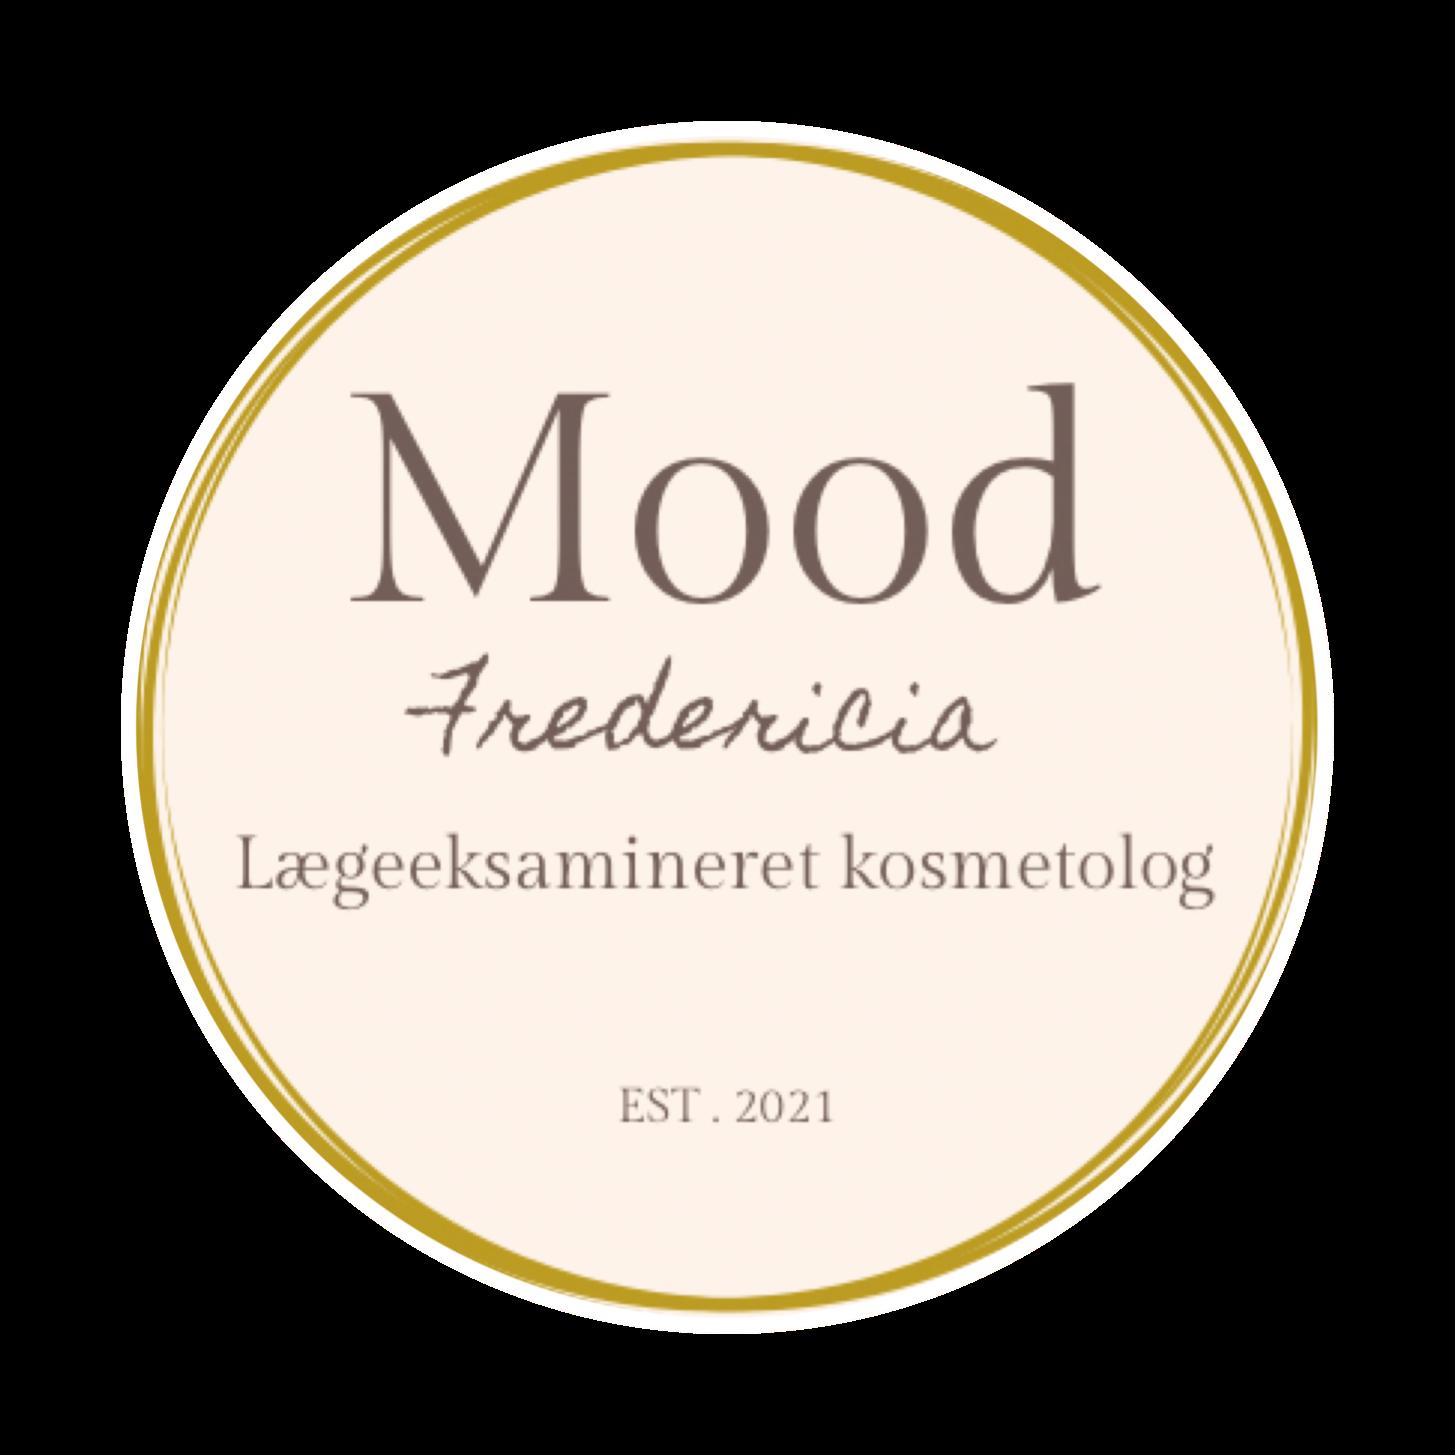 Moodfredericia Hudplejeklinik